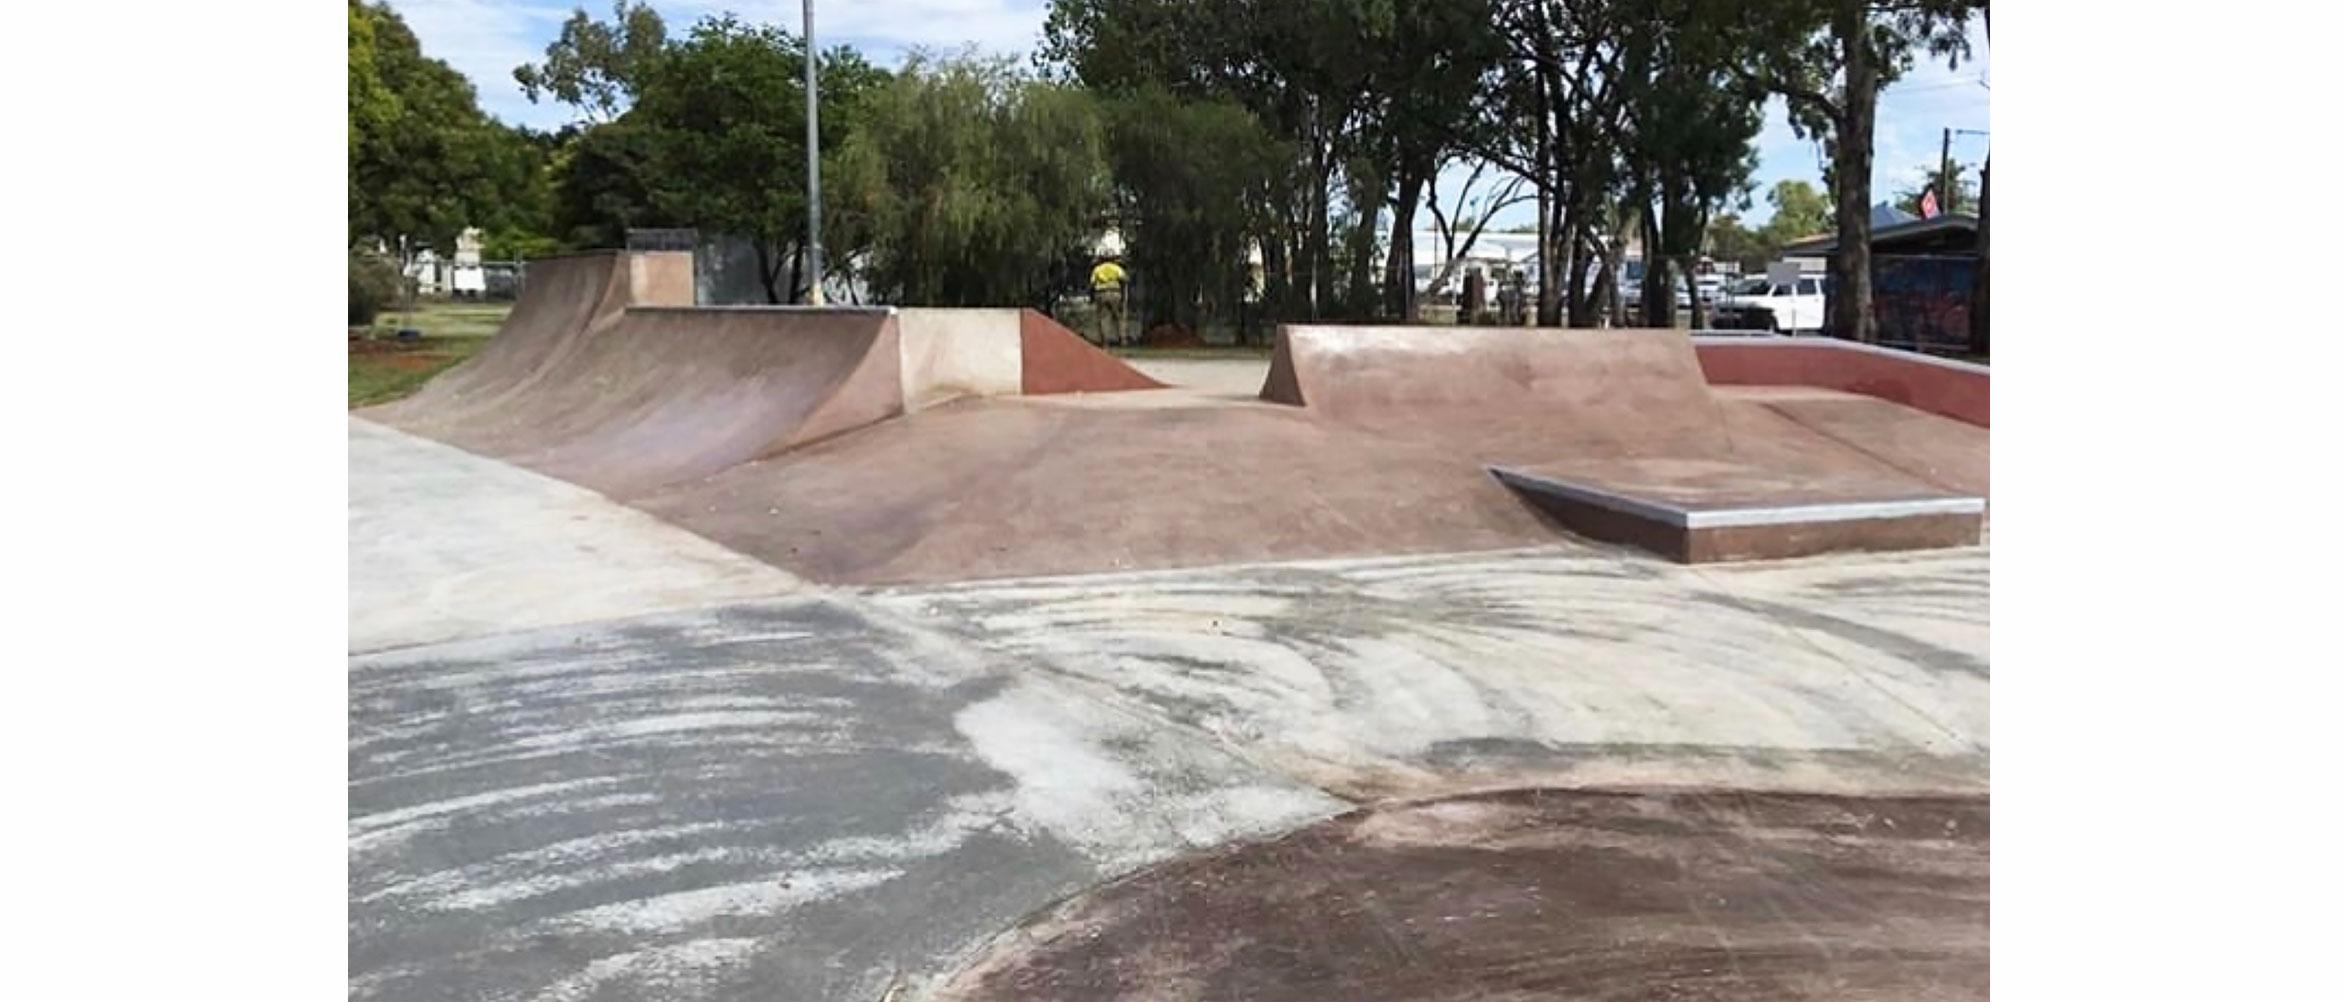 Chinchilla skate park hip